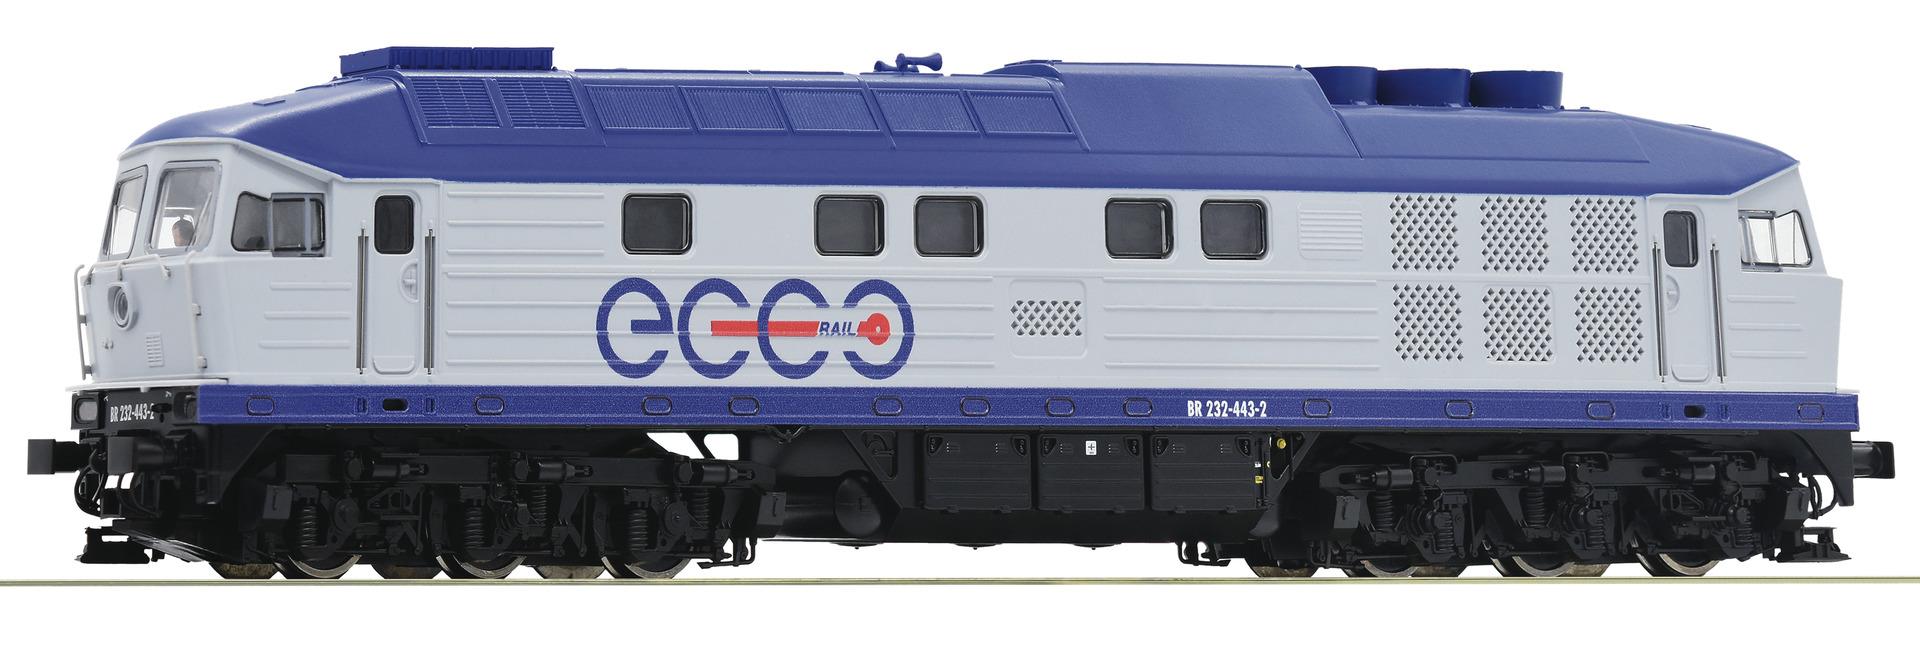 Roco-52467.jpg